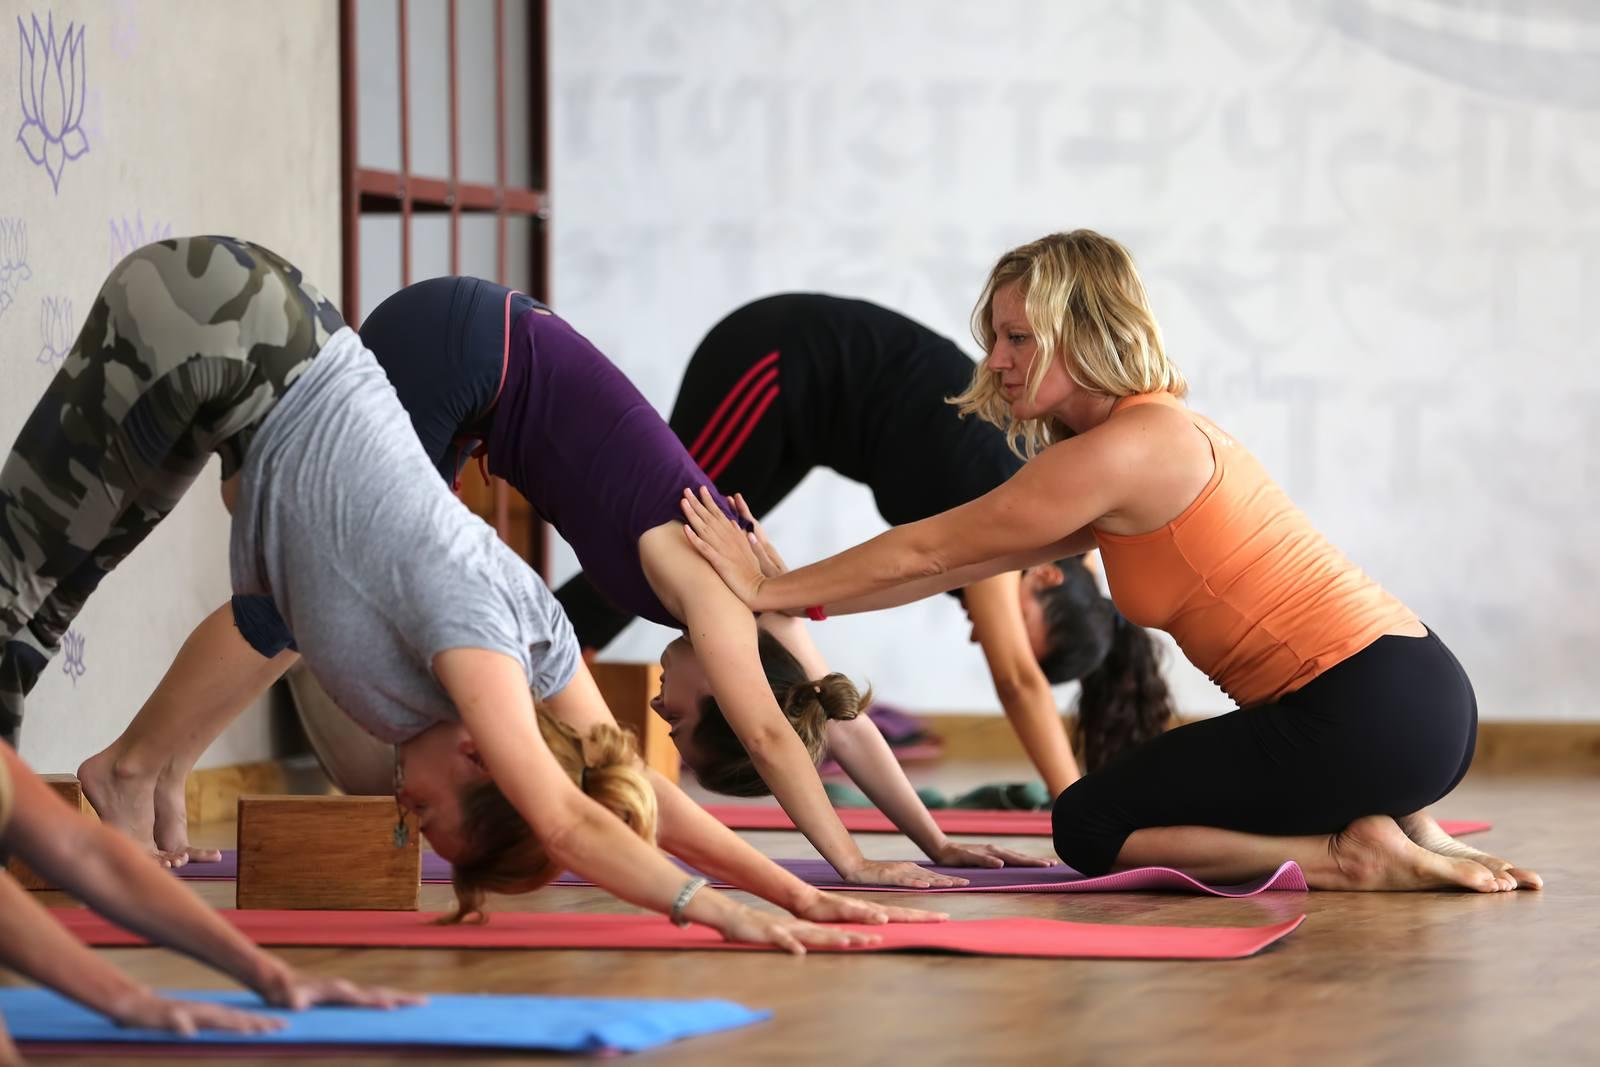 Yoga Teacher As Guide, Not Guru